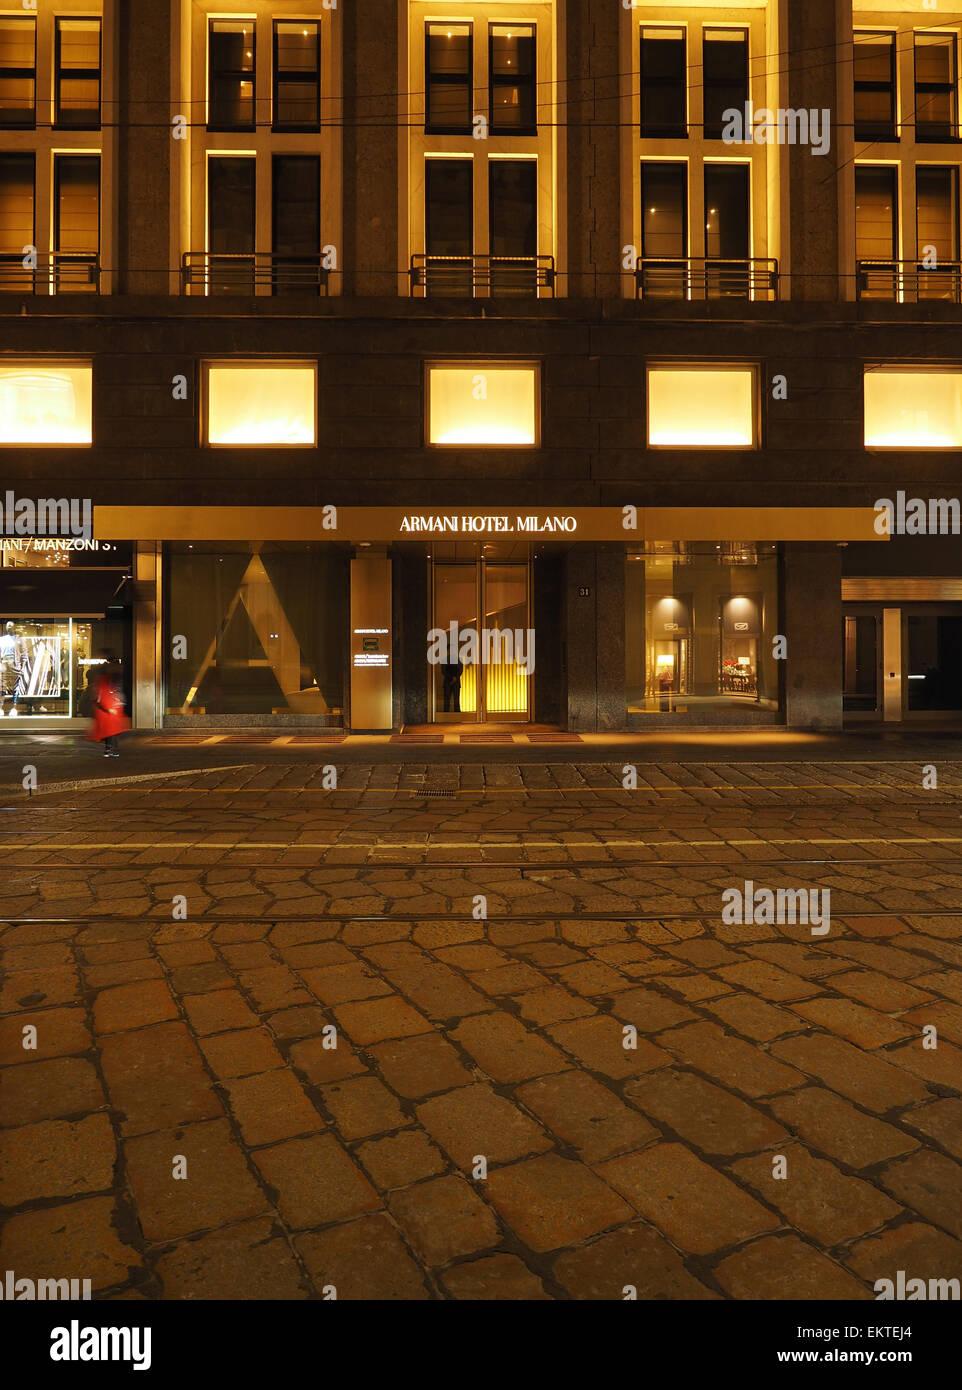 Armani Hotel Milano In 2019: Armani Hotel Stock Photos & Armani Hotel Stock Images